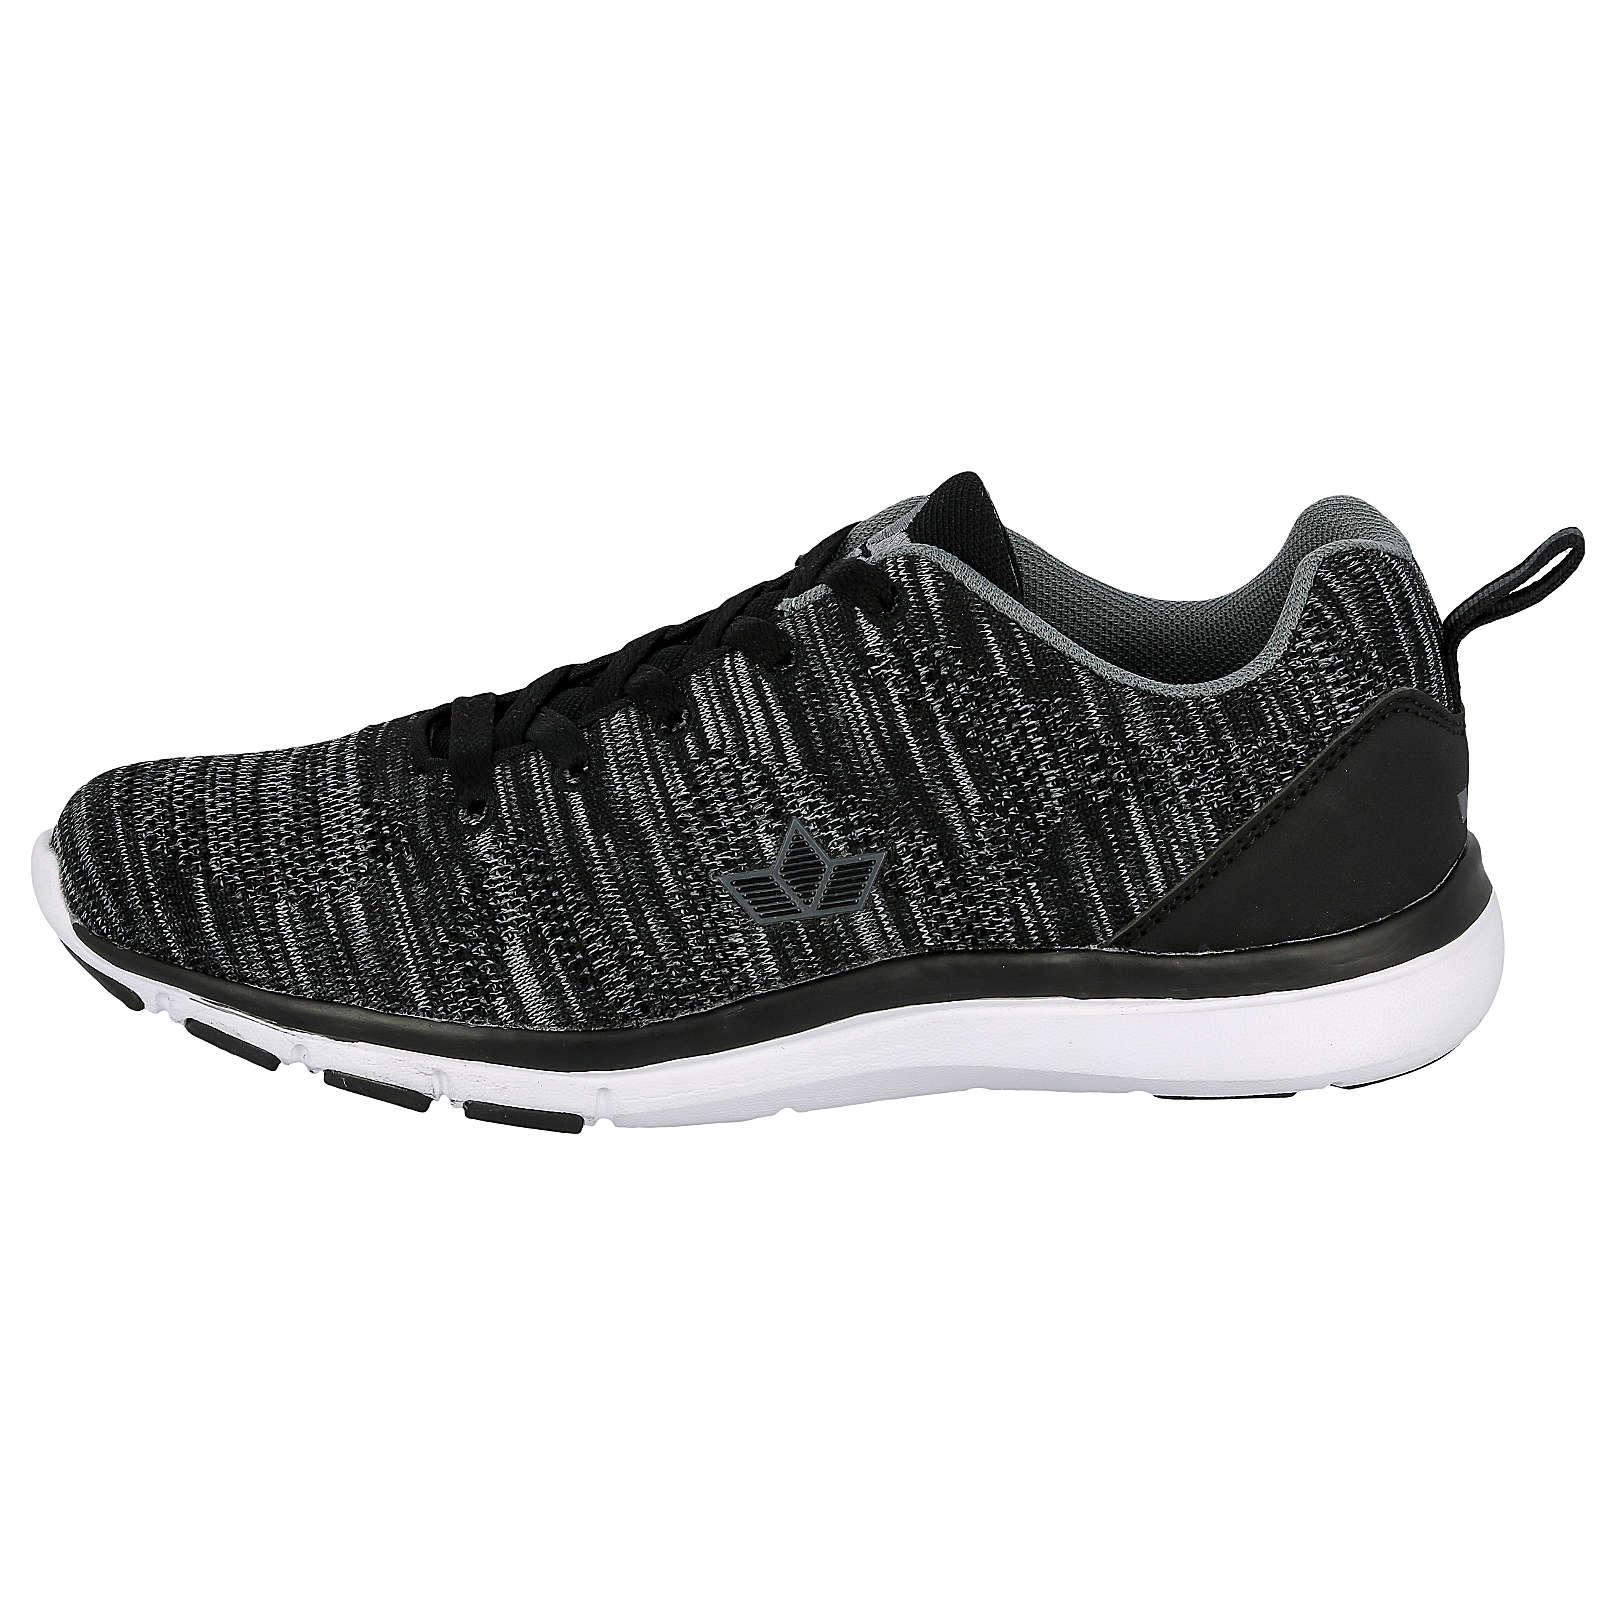 LICO Freizeitschuh Colour Sneakers Low grau Herren Gr. 42